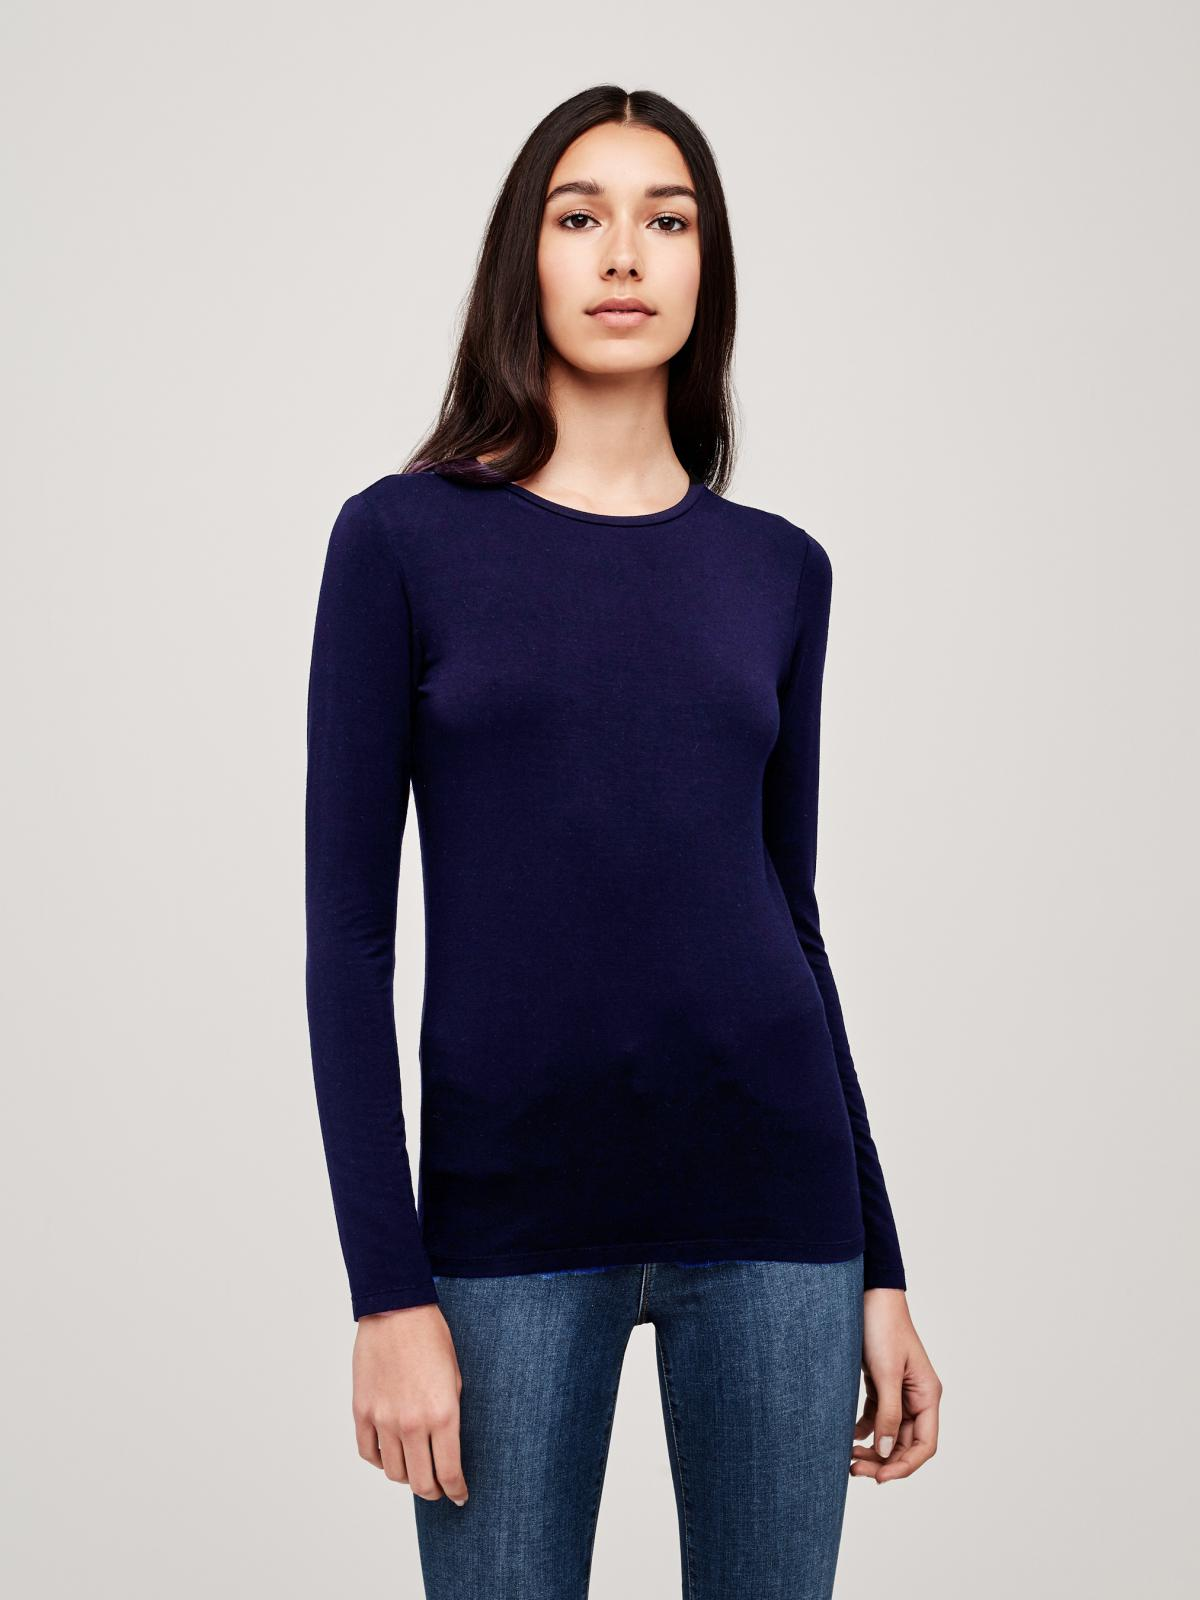 fb34c5e0f Lyst - L'Agence Tess Long Sleeve Tee in Blue